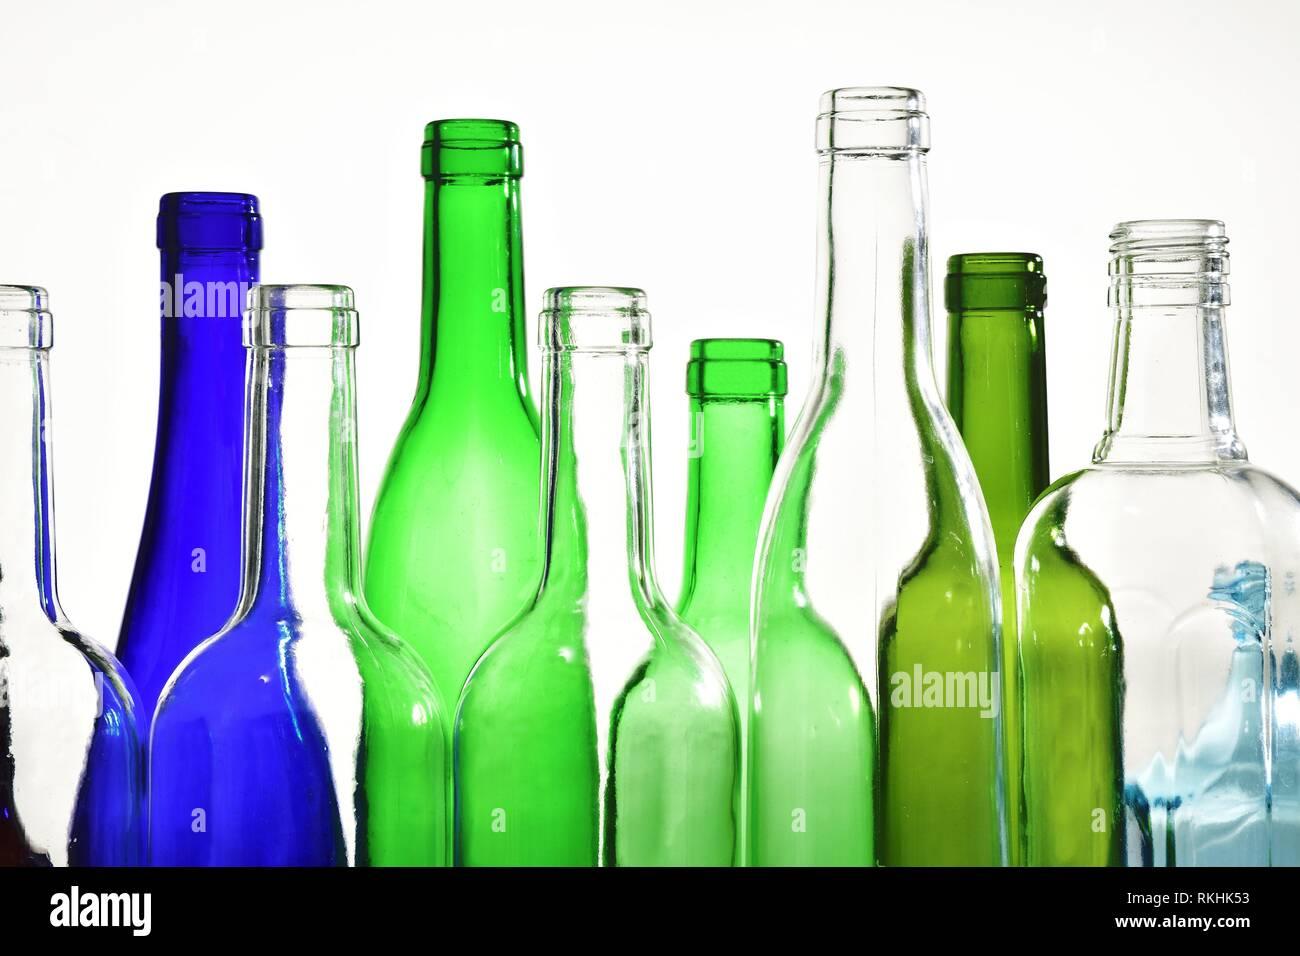 bottlenecks on white background,. - Stock Image